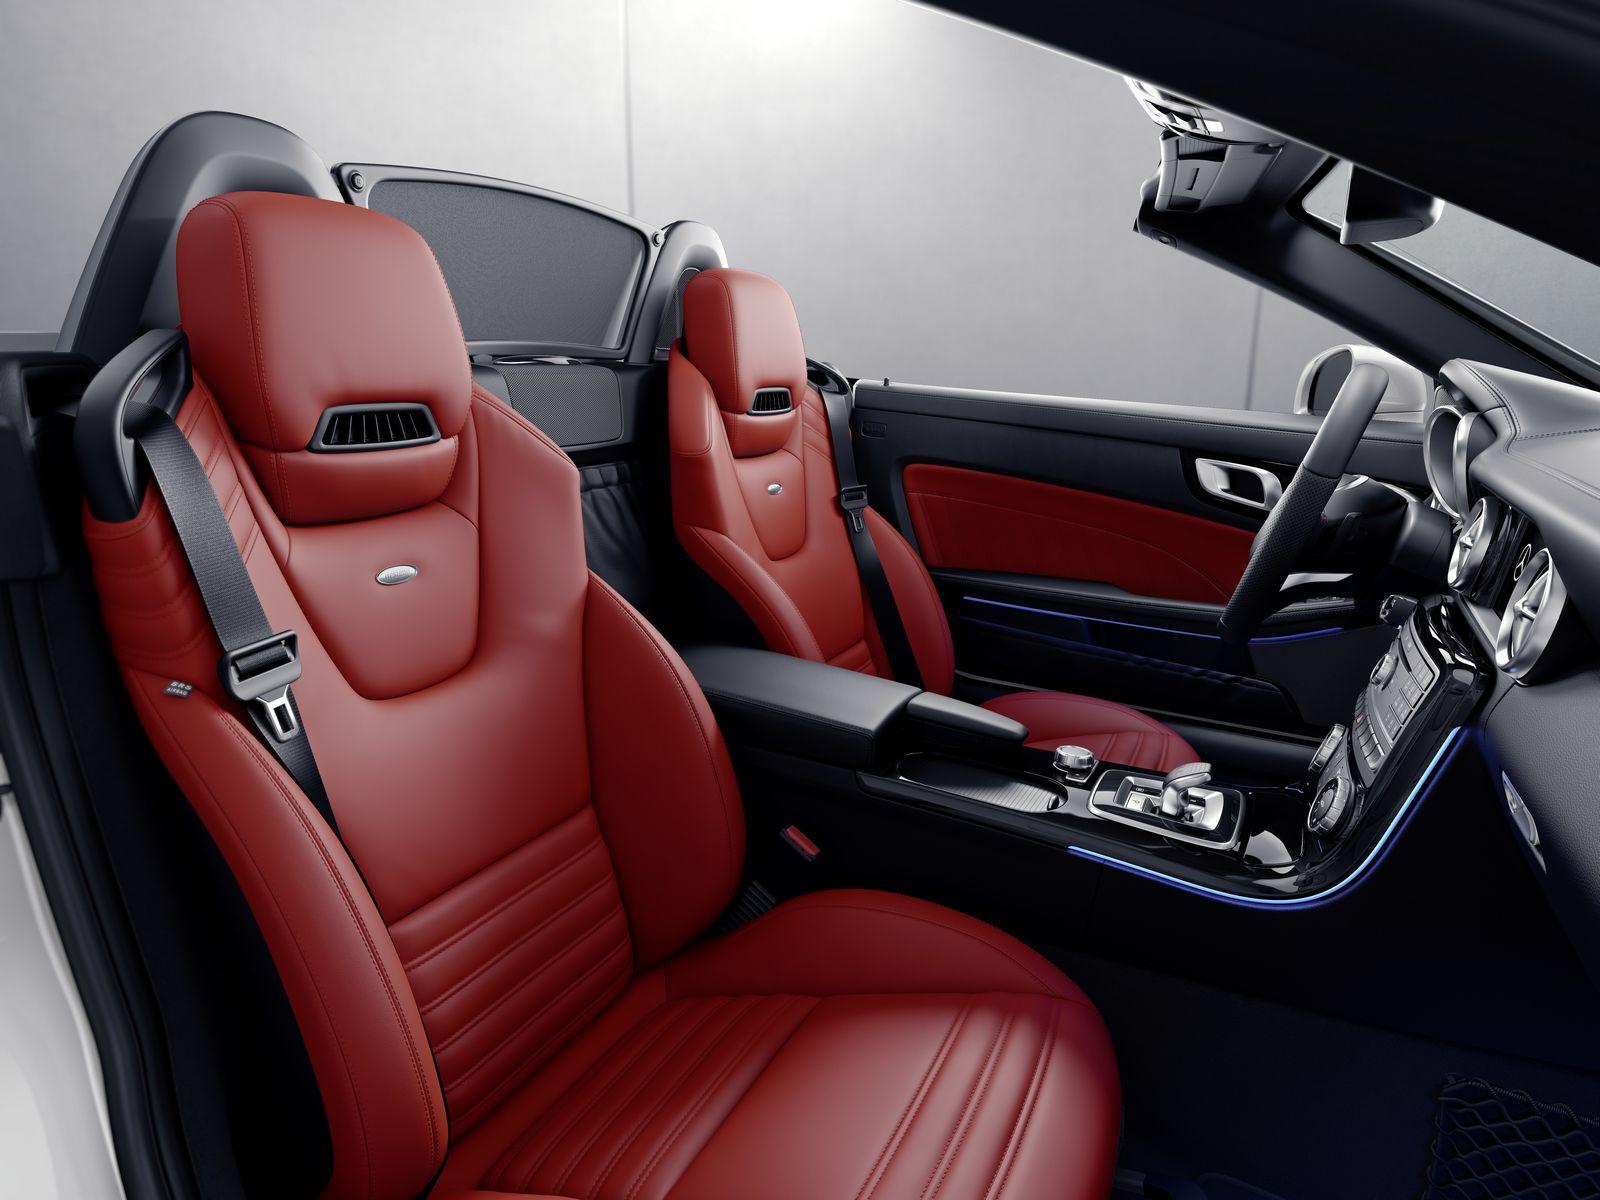 Mercedes-Benz SLC RedArt Edition